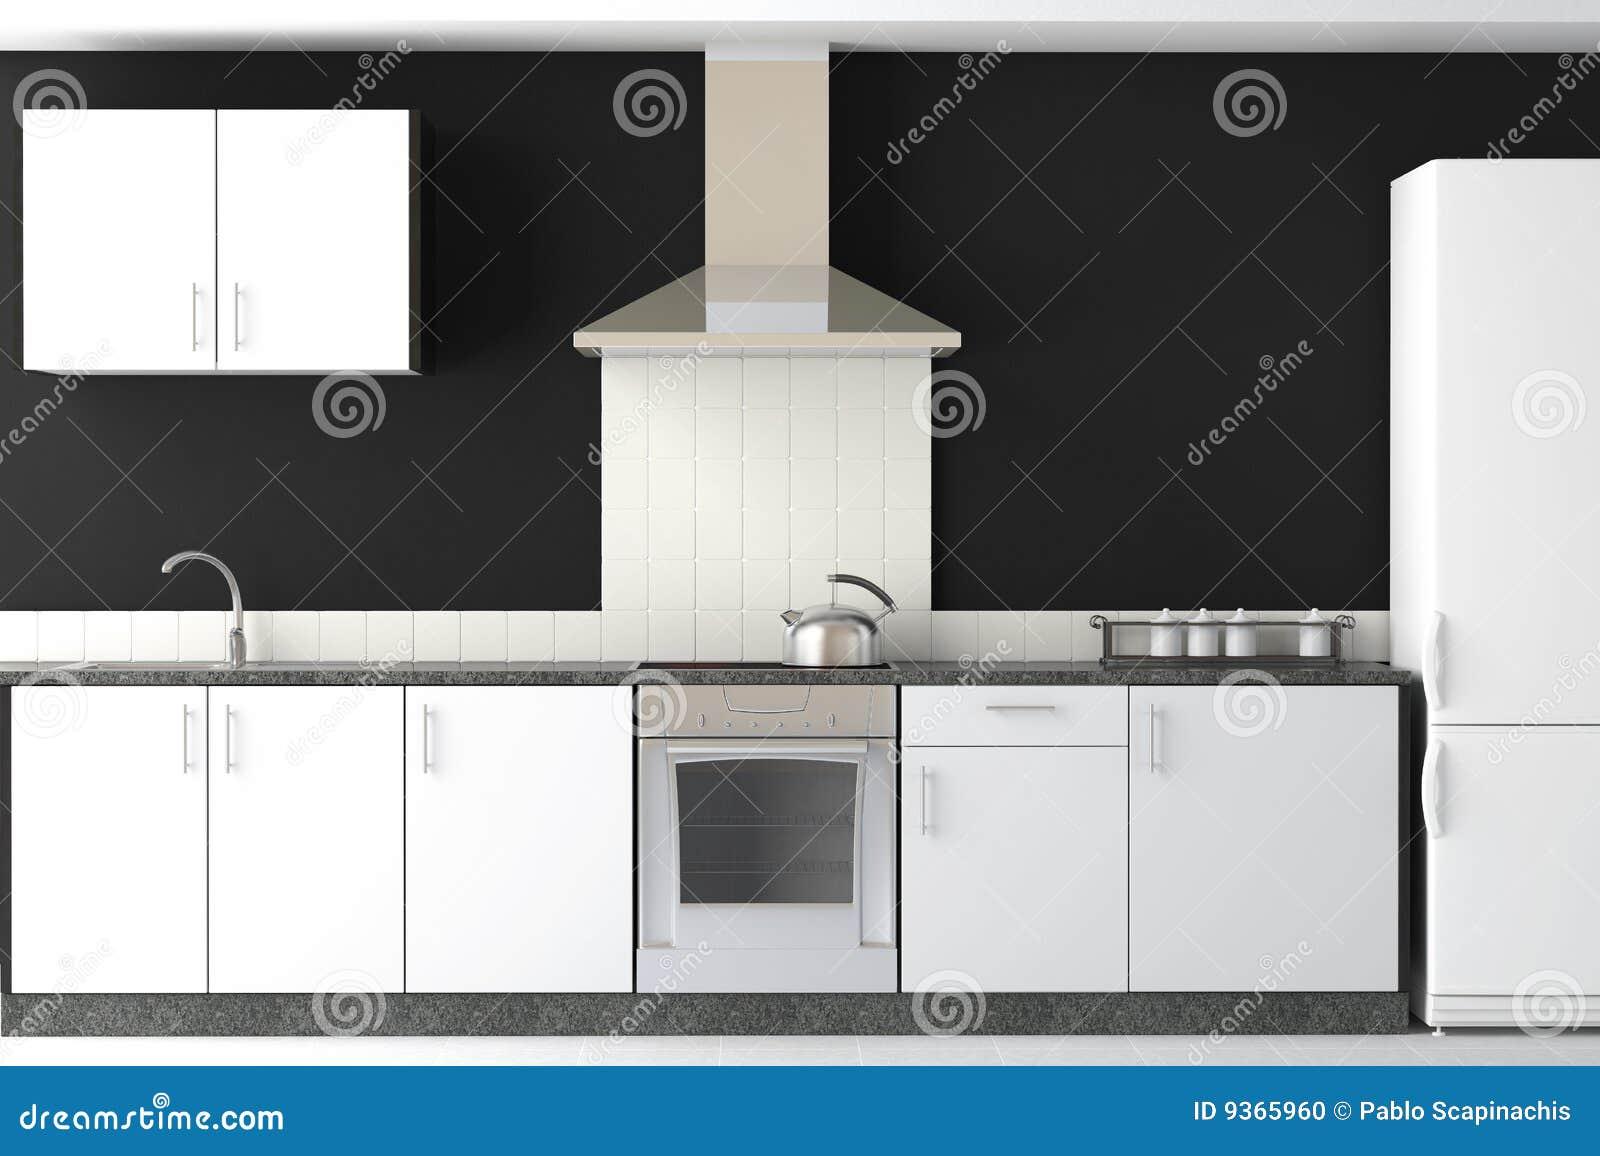 Interior design of modern black kitchen stock illustration